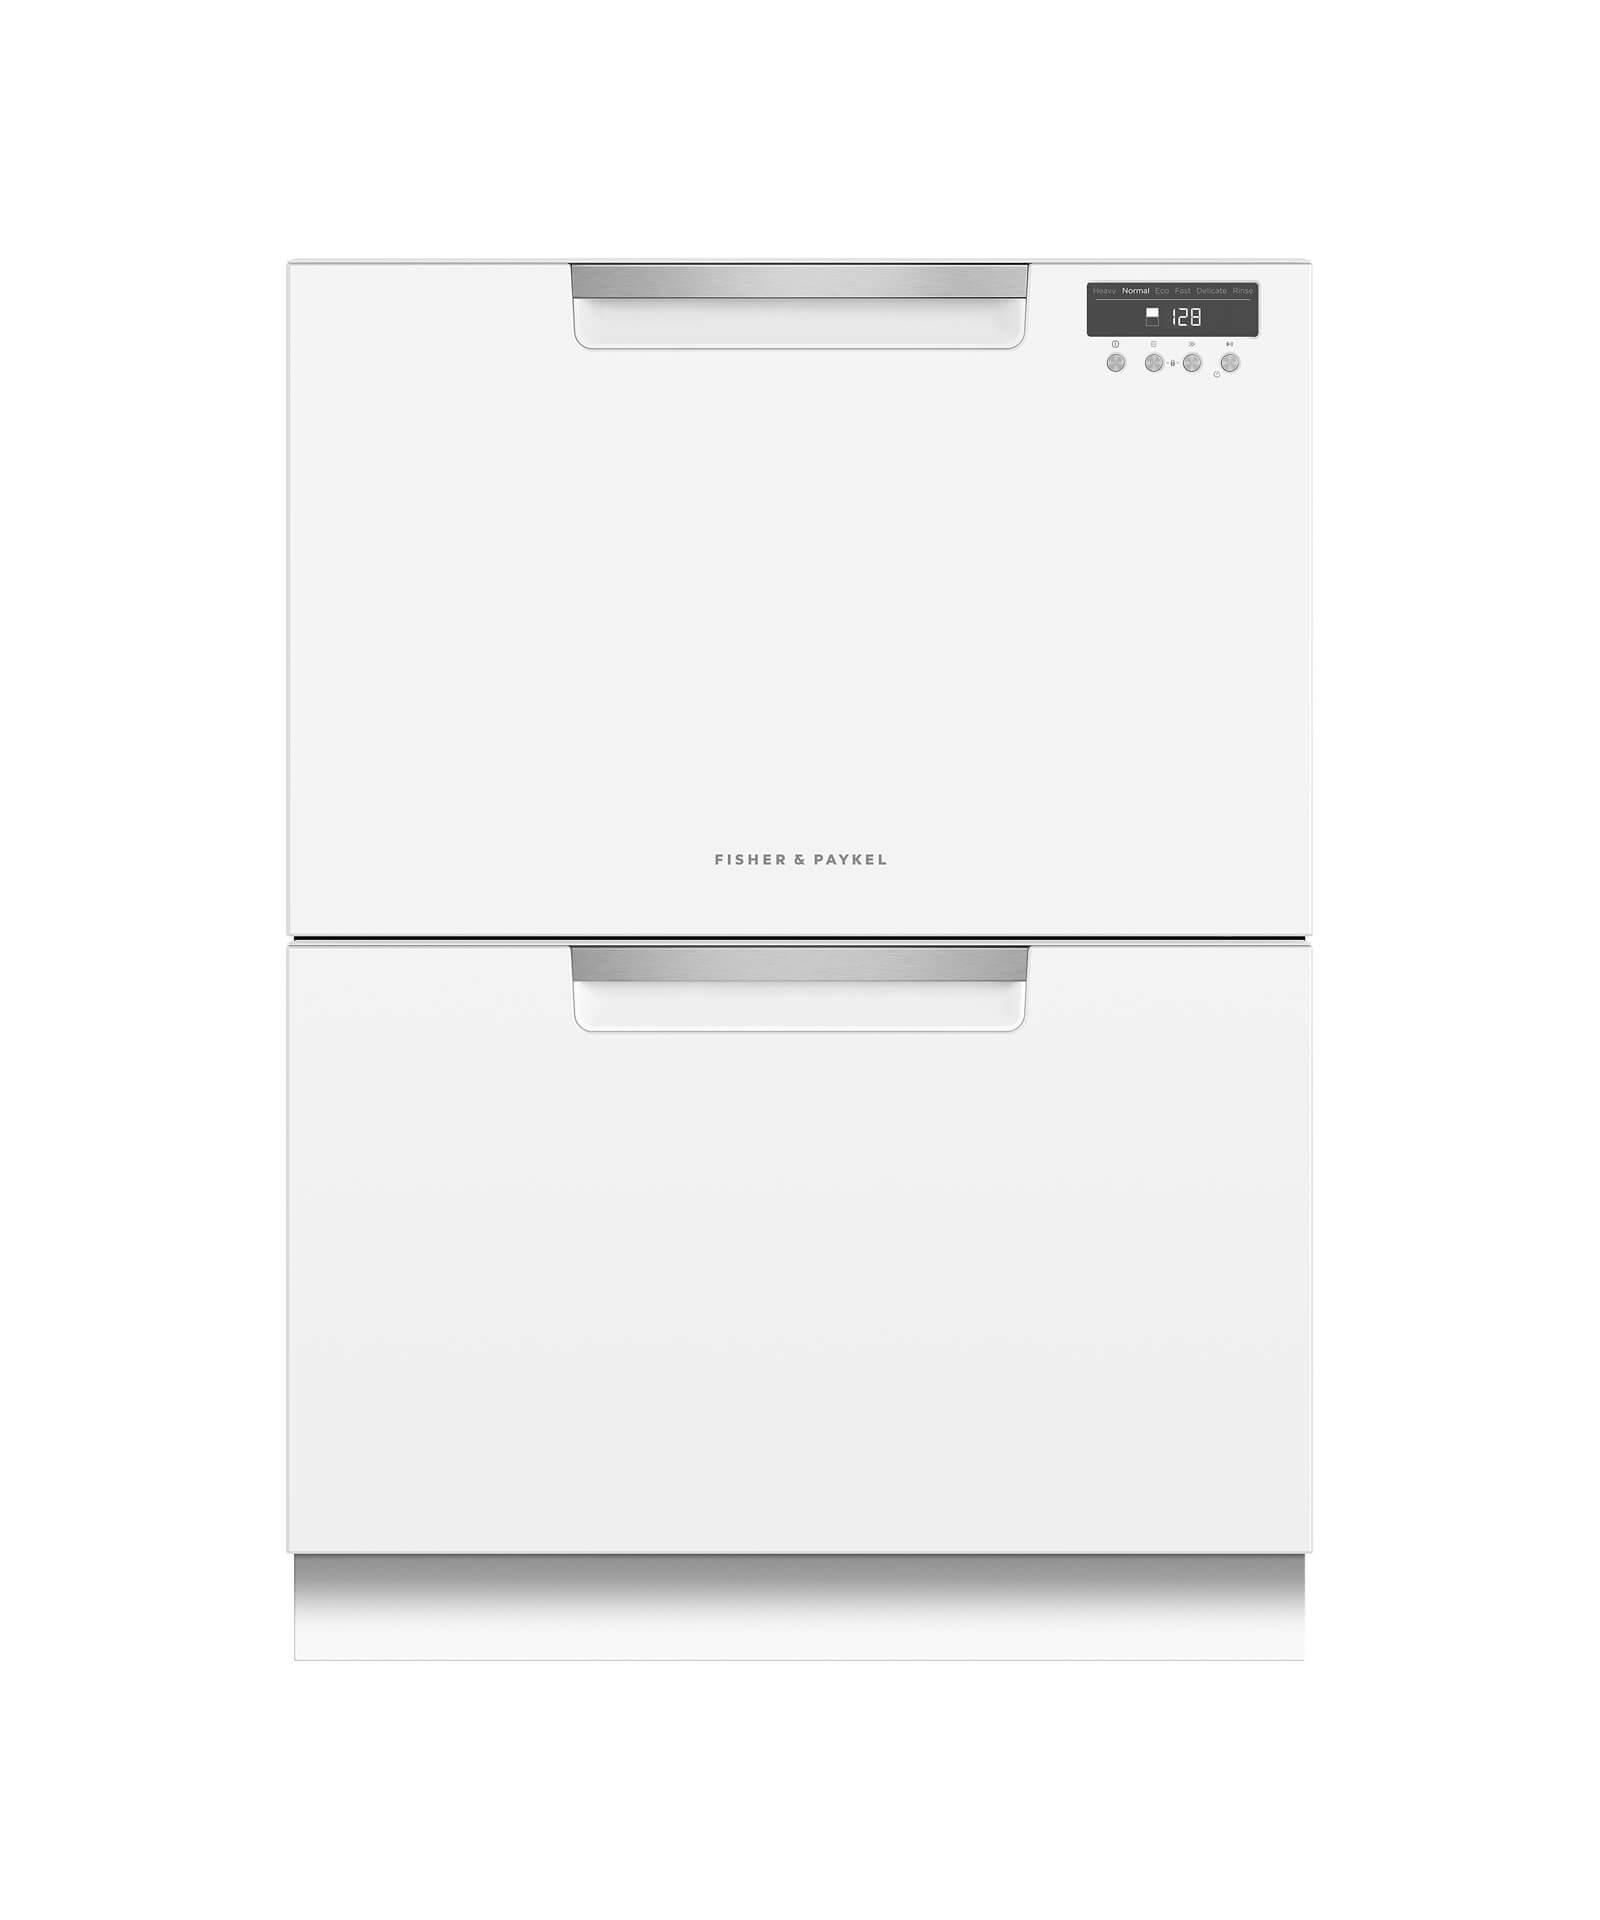 Double DishDrawer™ Dishwasher, 14 Place Settings